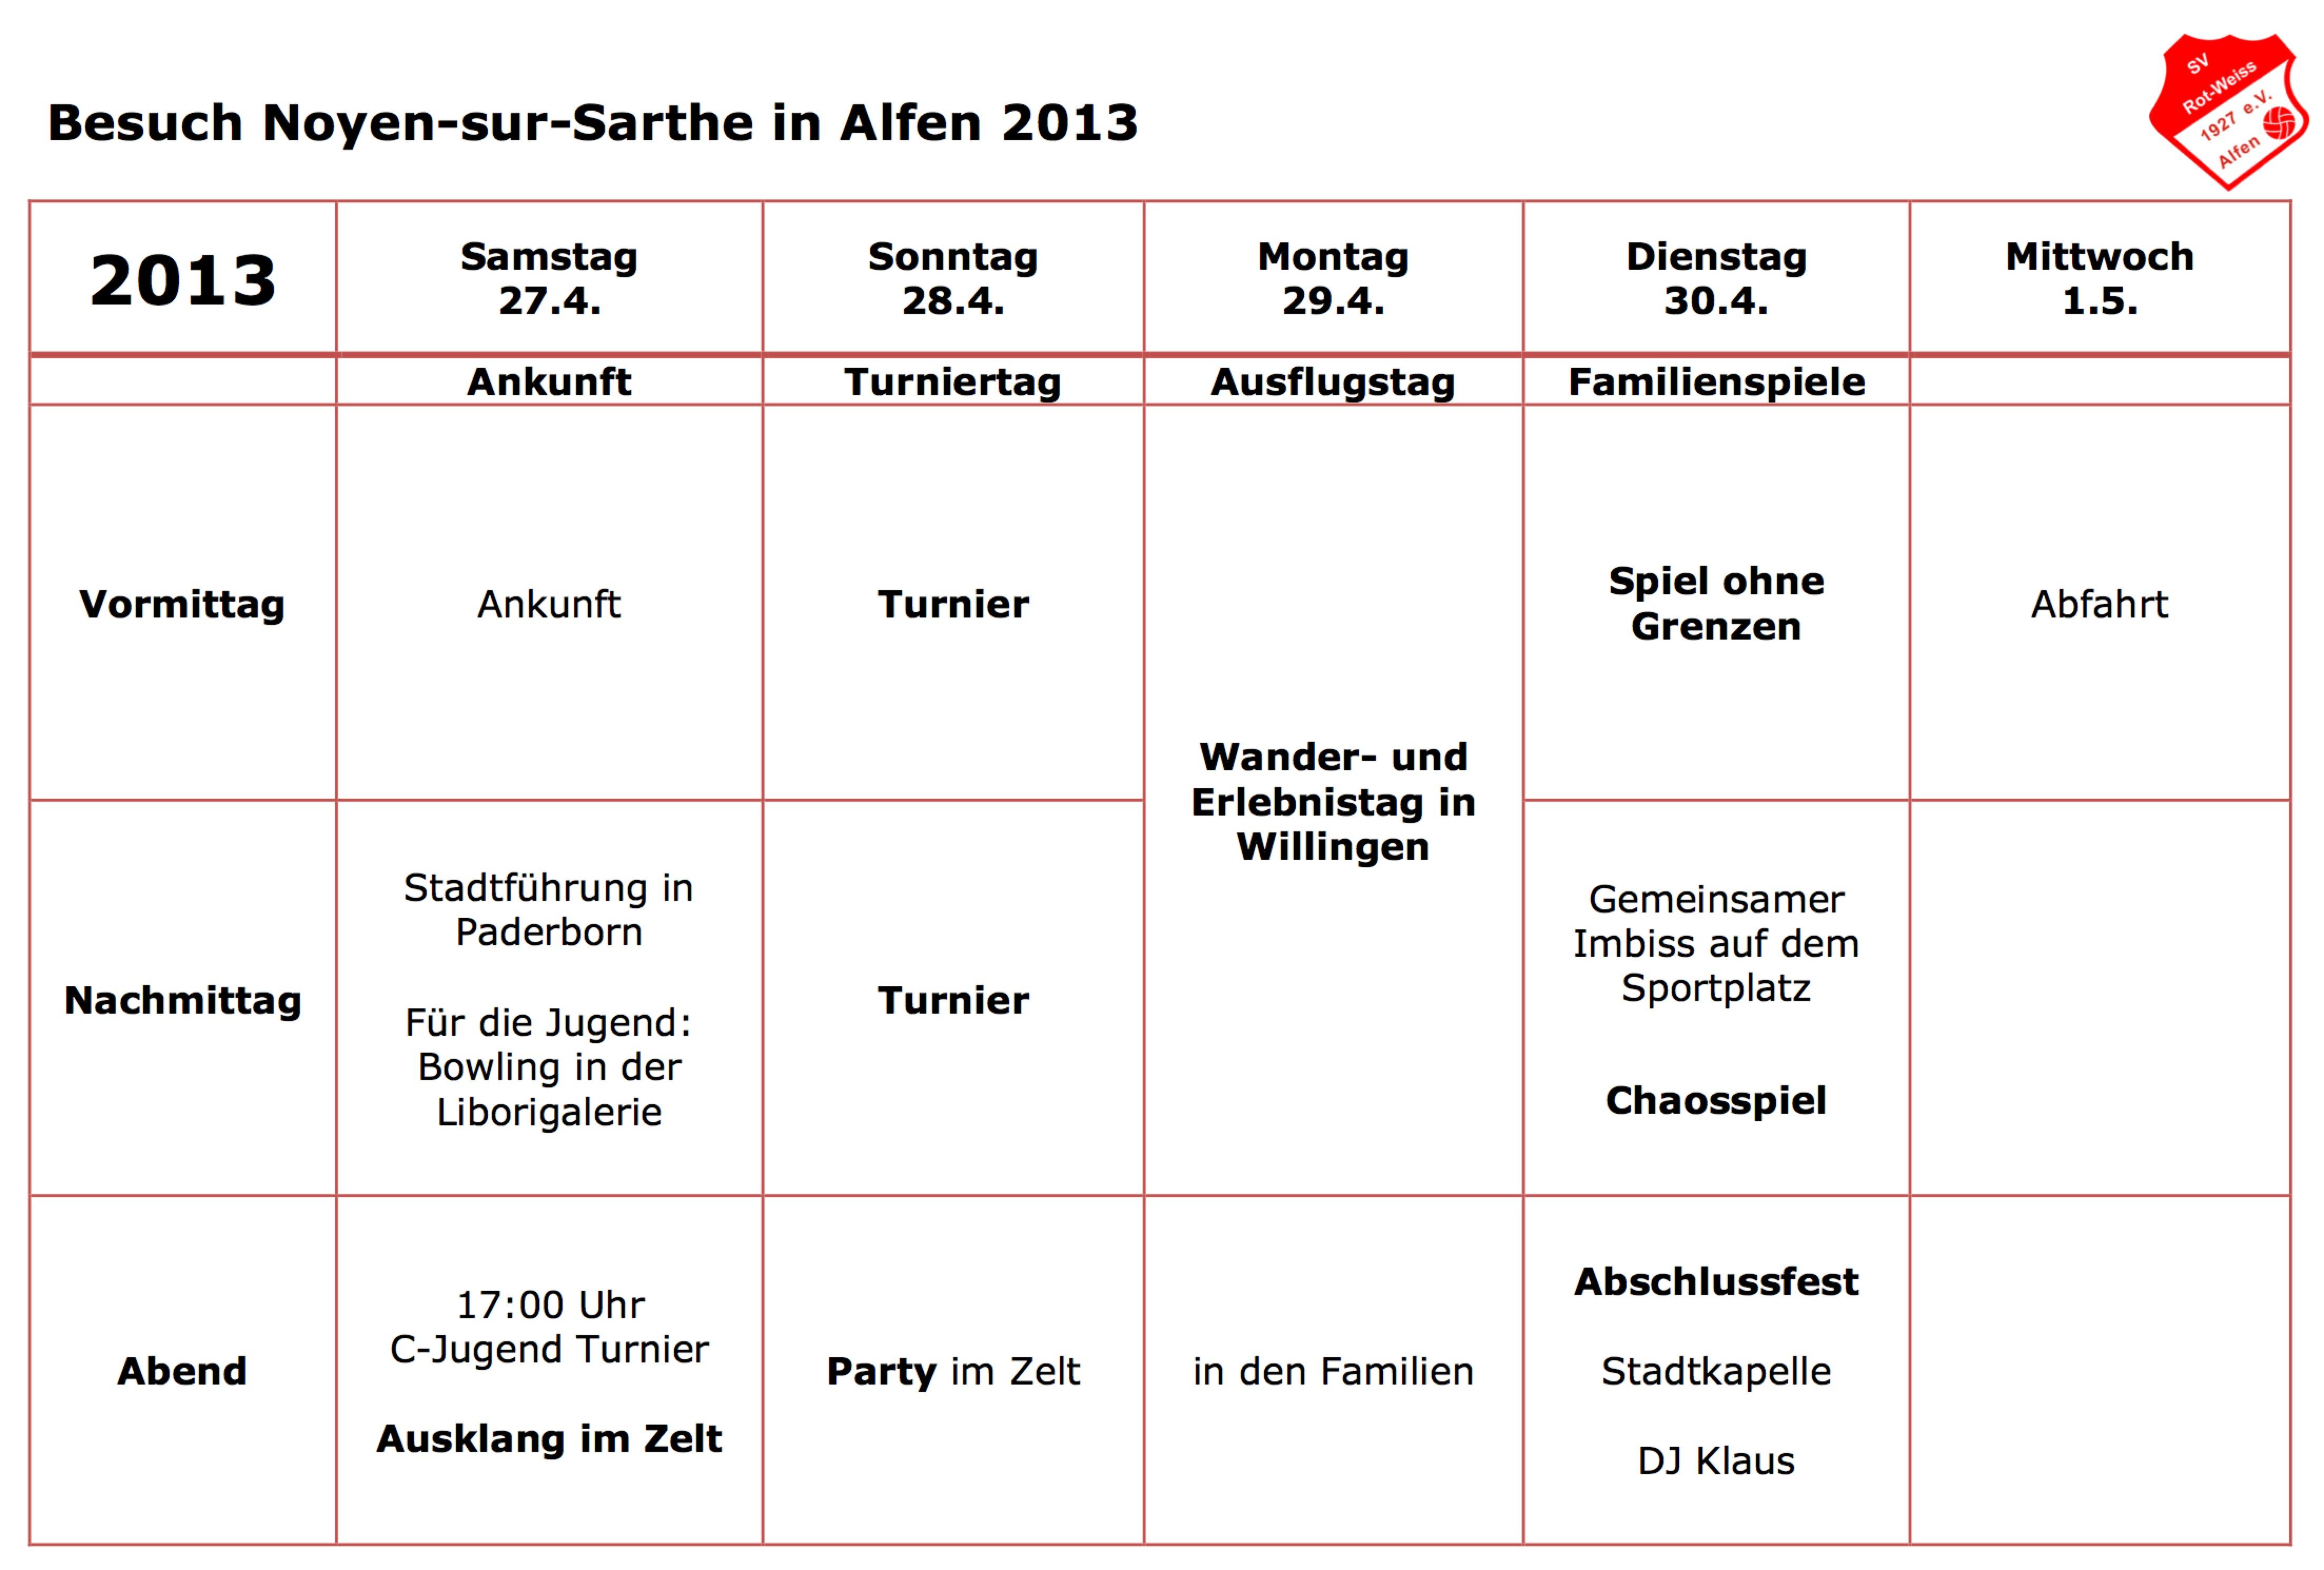 Planung 2013 alfenweb for Garage noyen sur sarthe